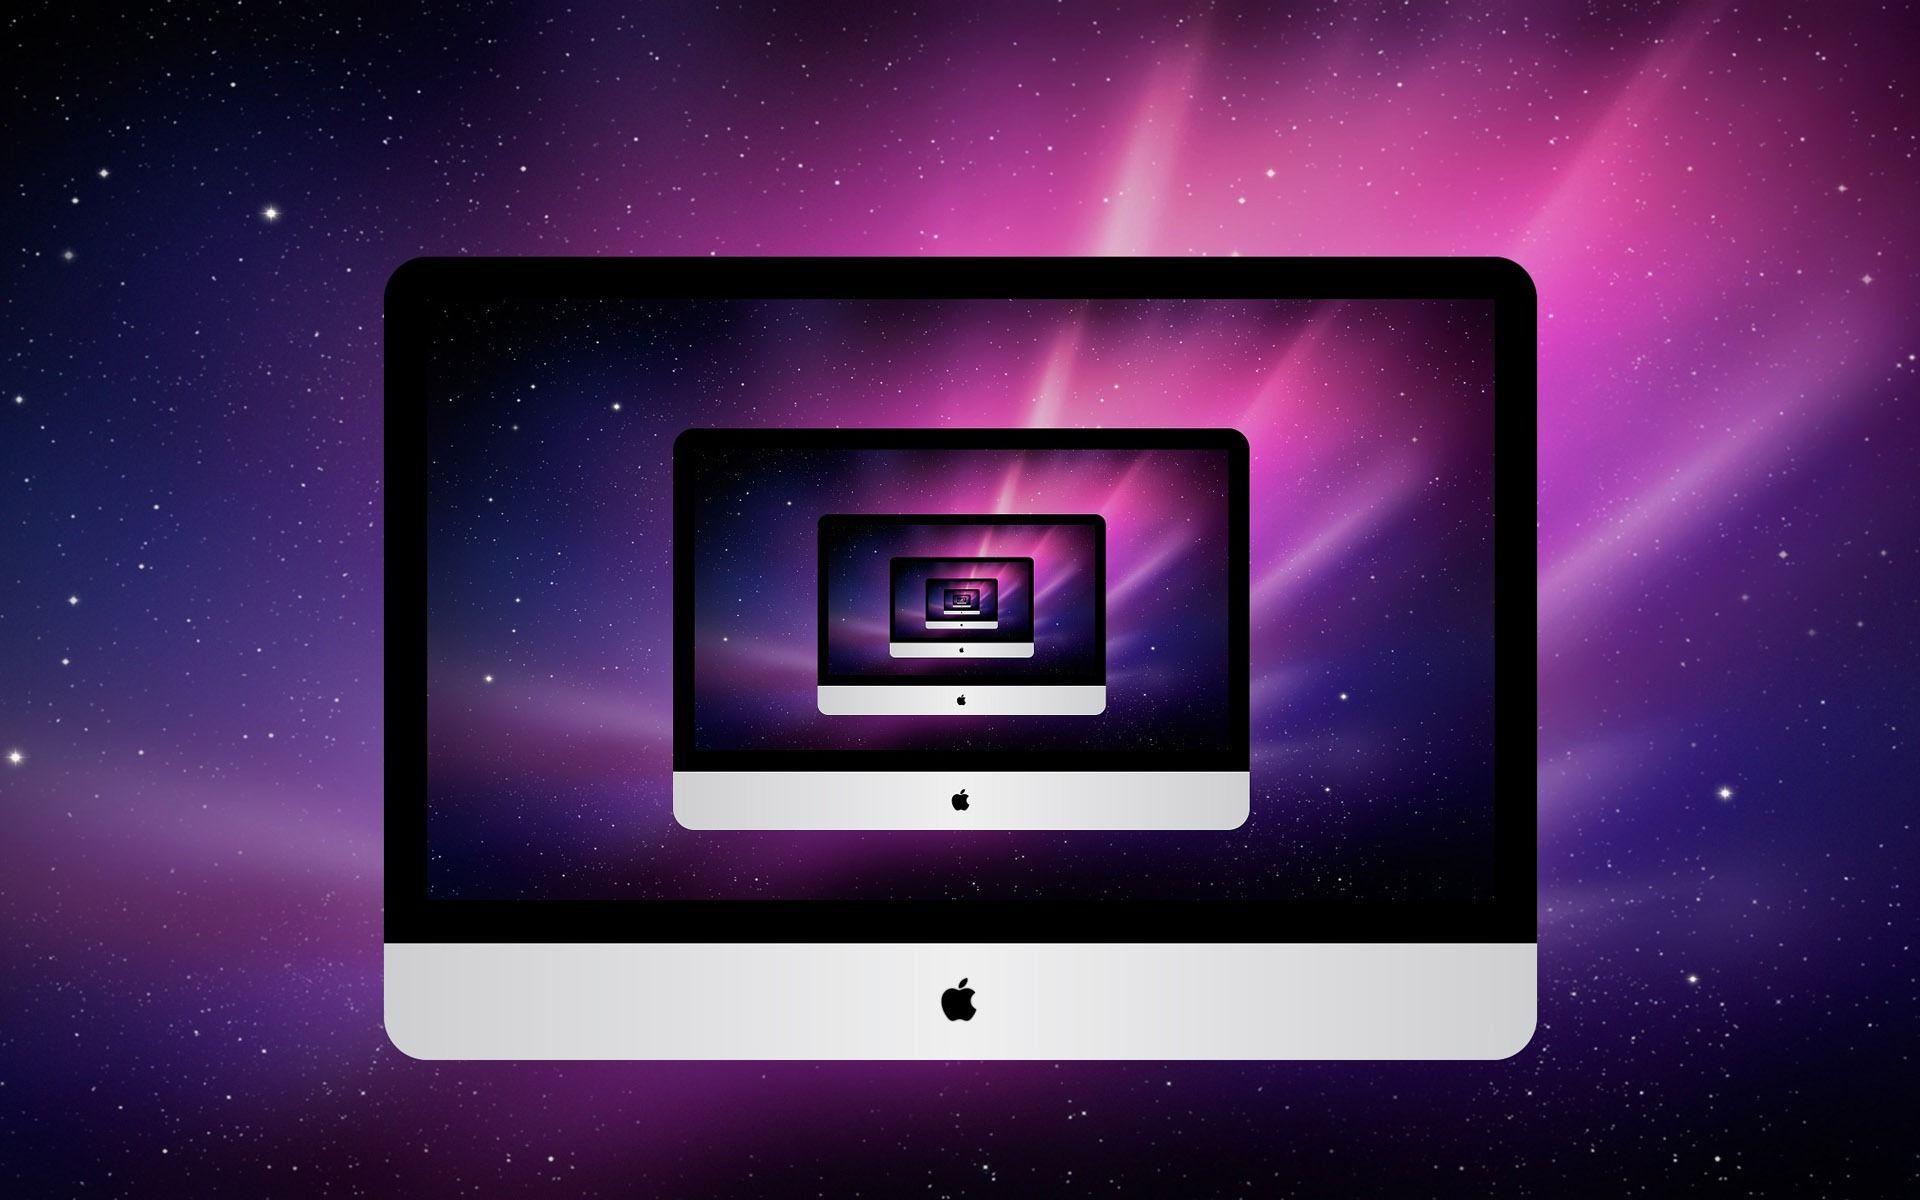 Apple IMac Wallpapers - Wallpaper Cave